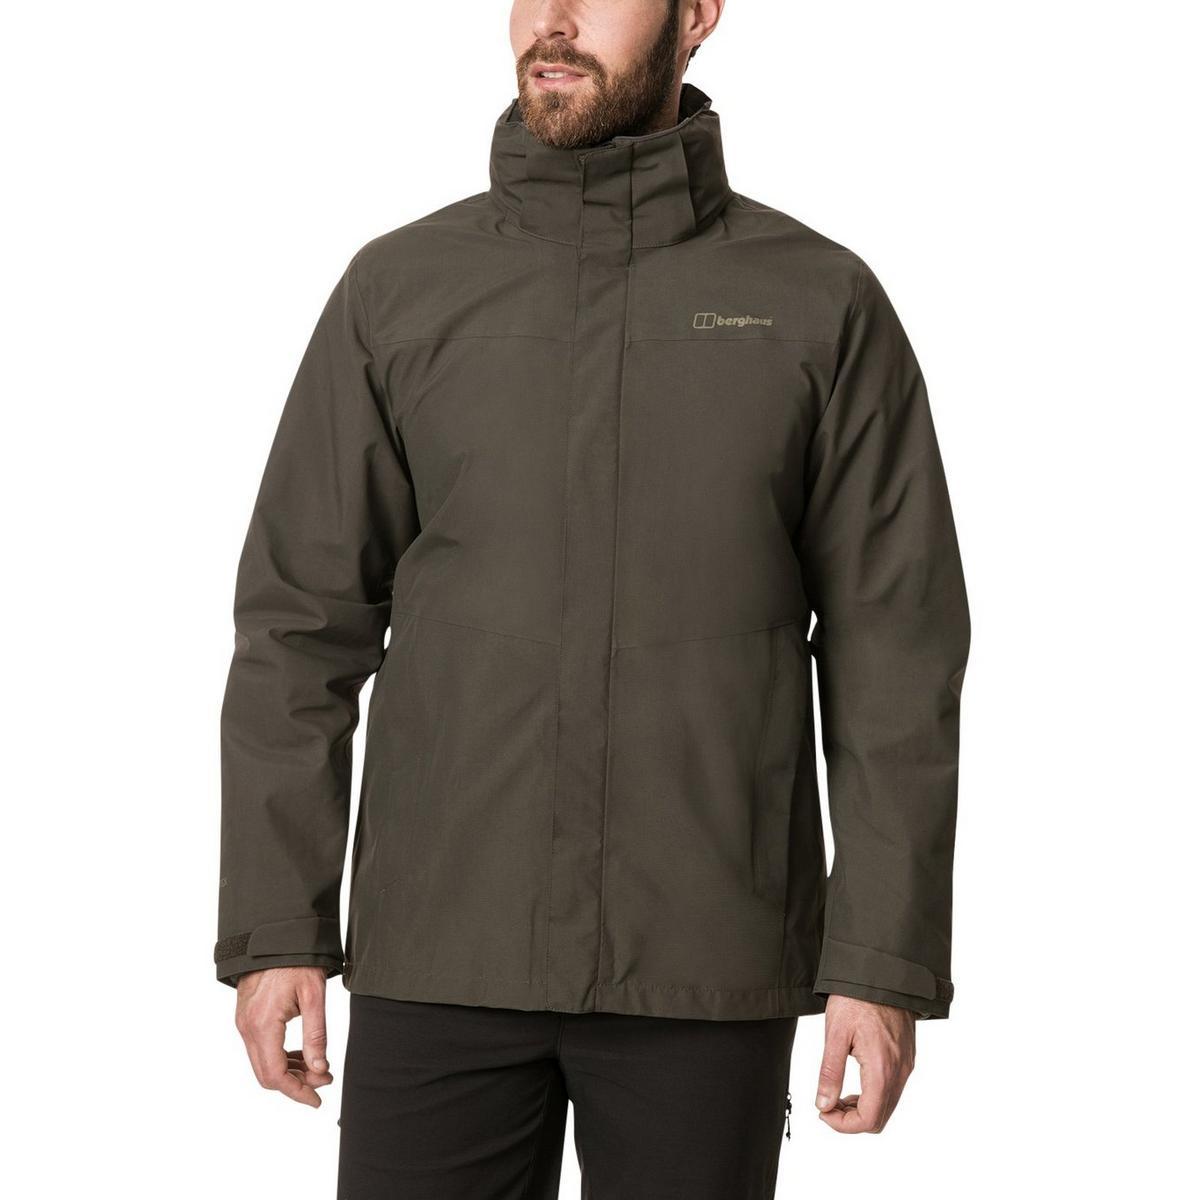 Berghaus Men's Berghaus Hillwalker Gemini 3in1 Waterproof Jacket - Green